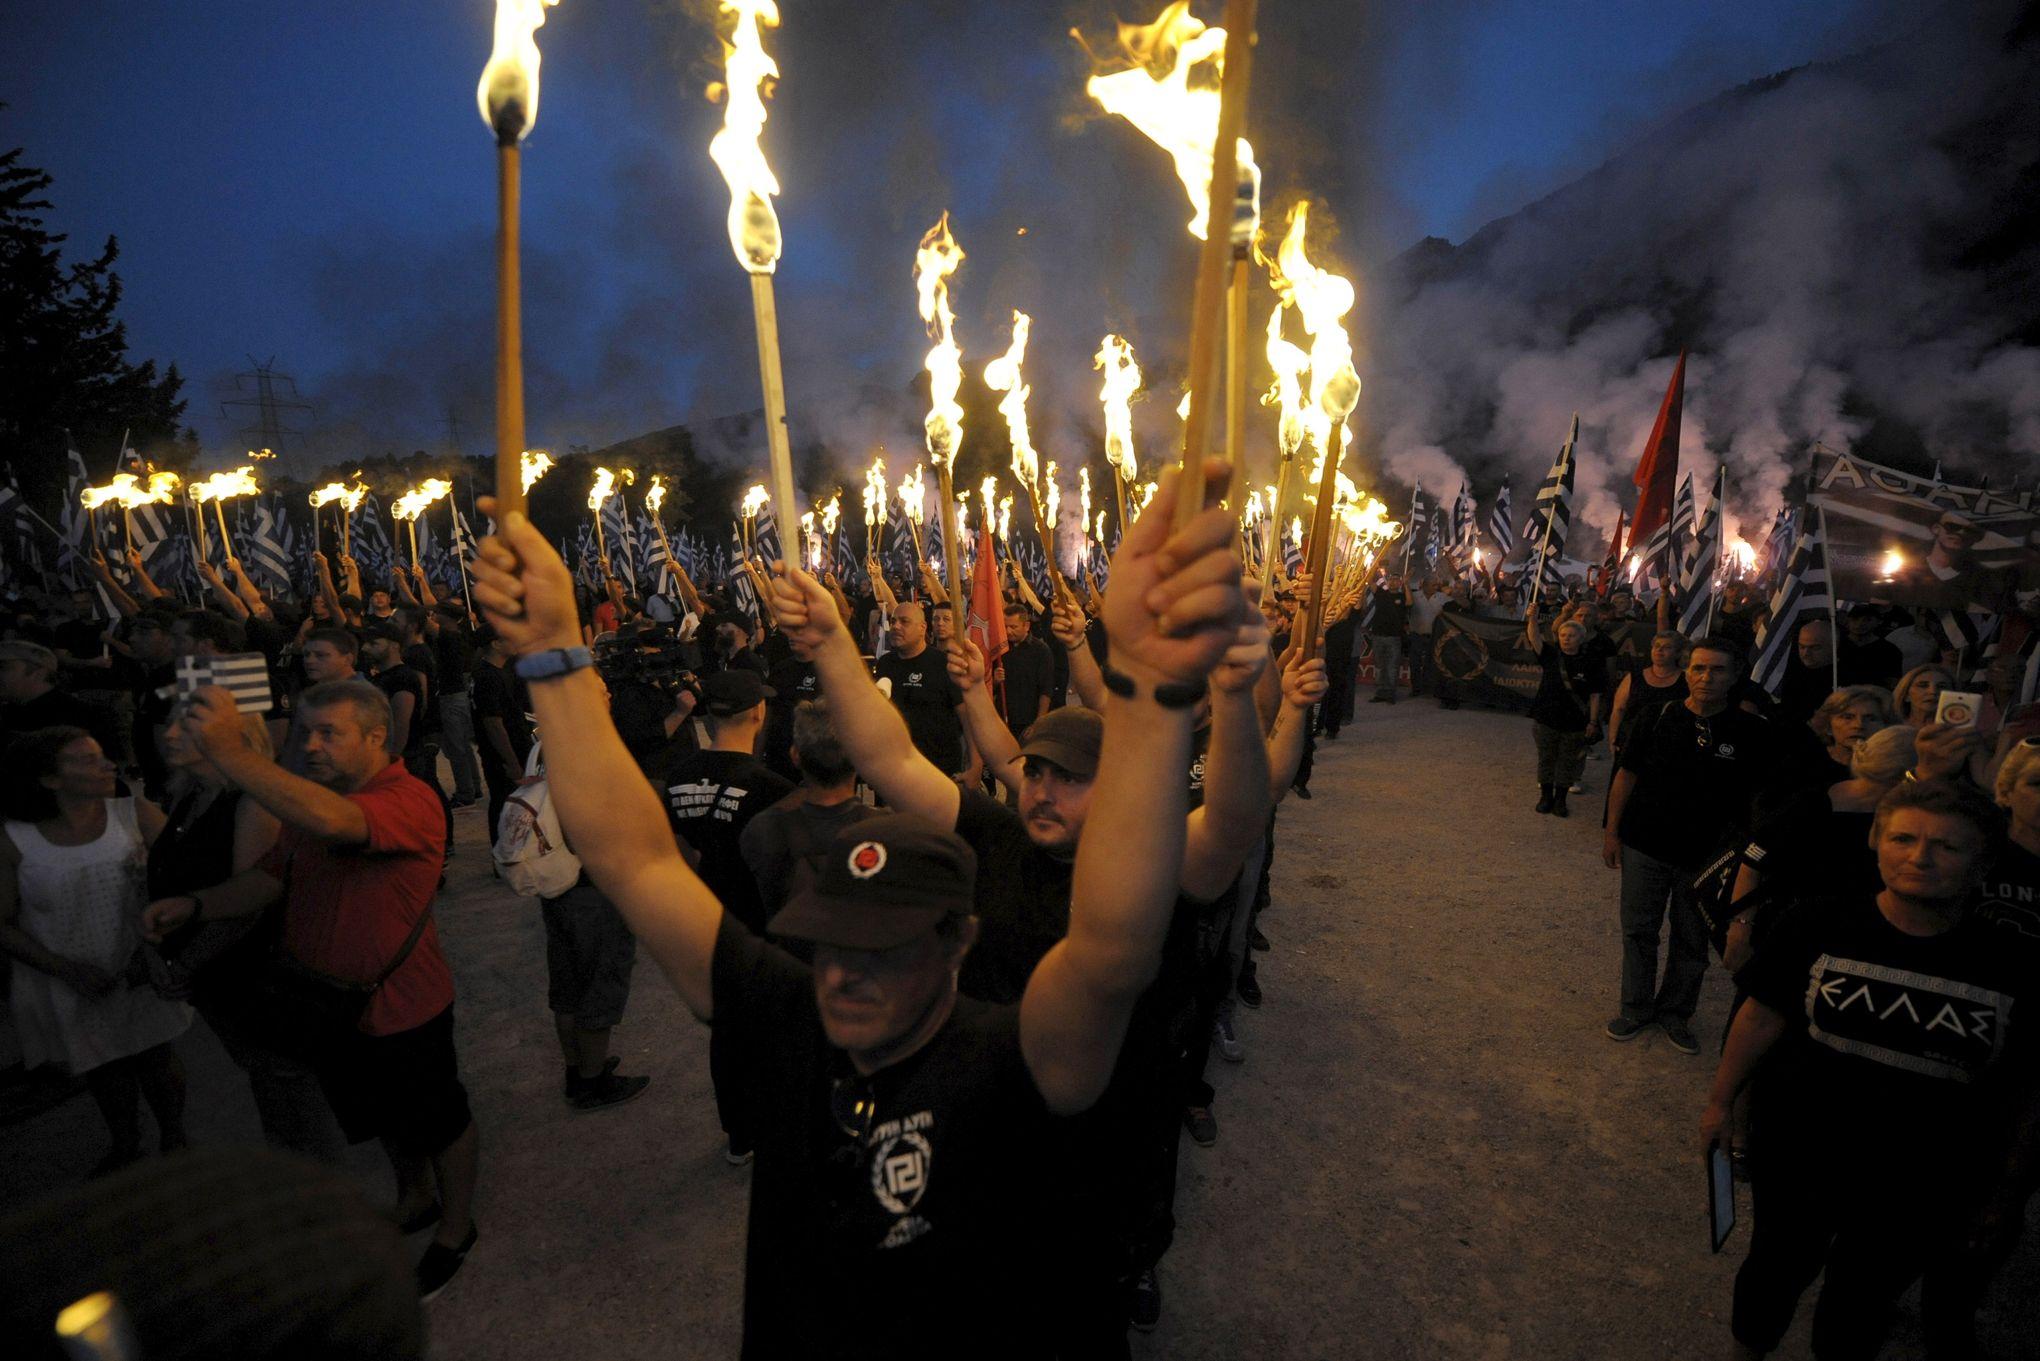 international artfig pese reellement extreme droite europe